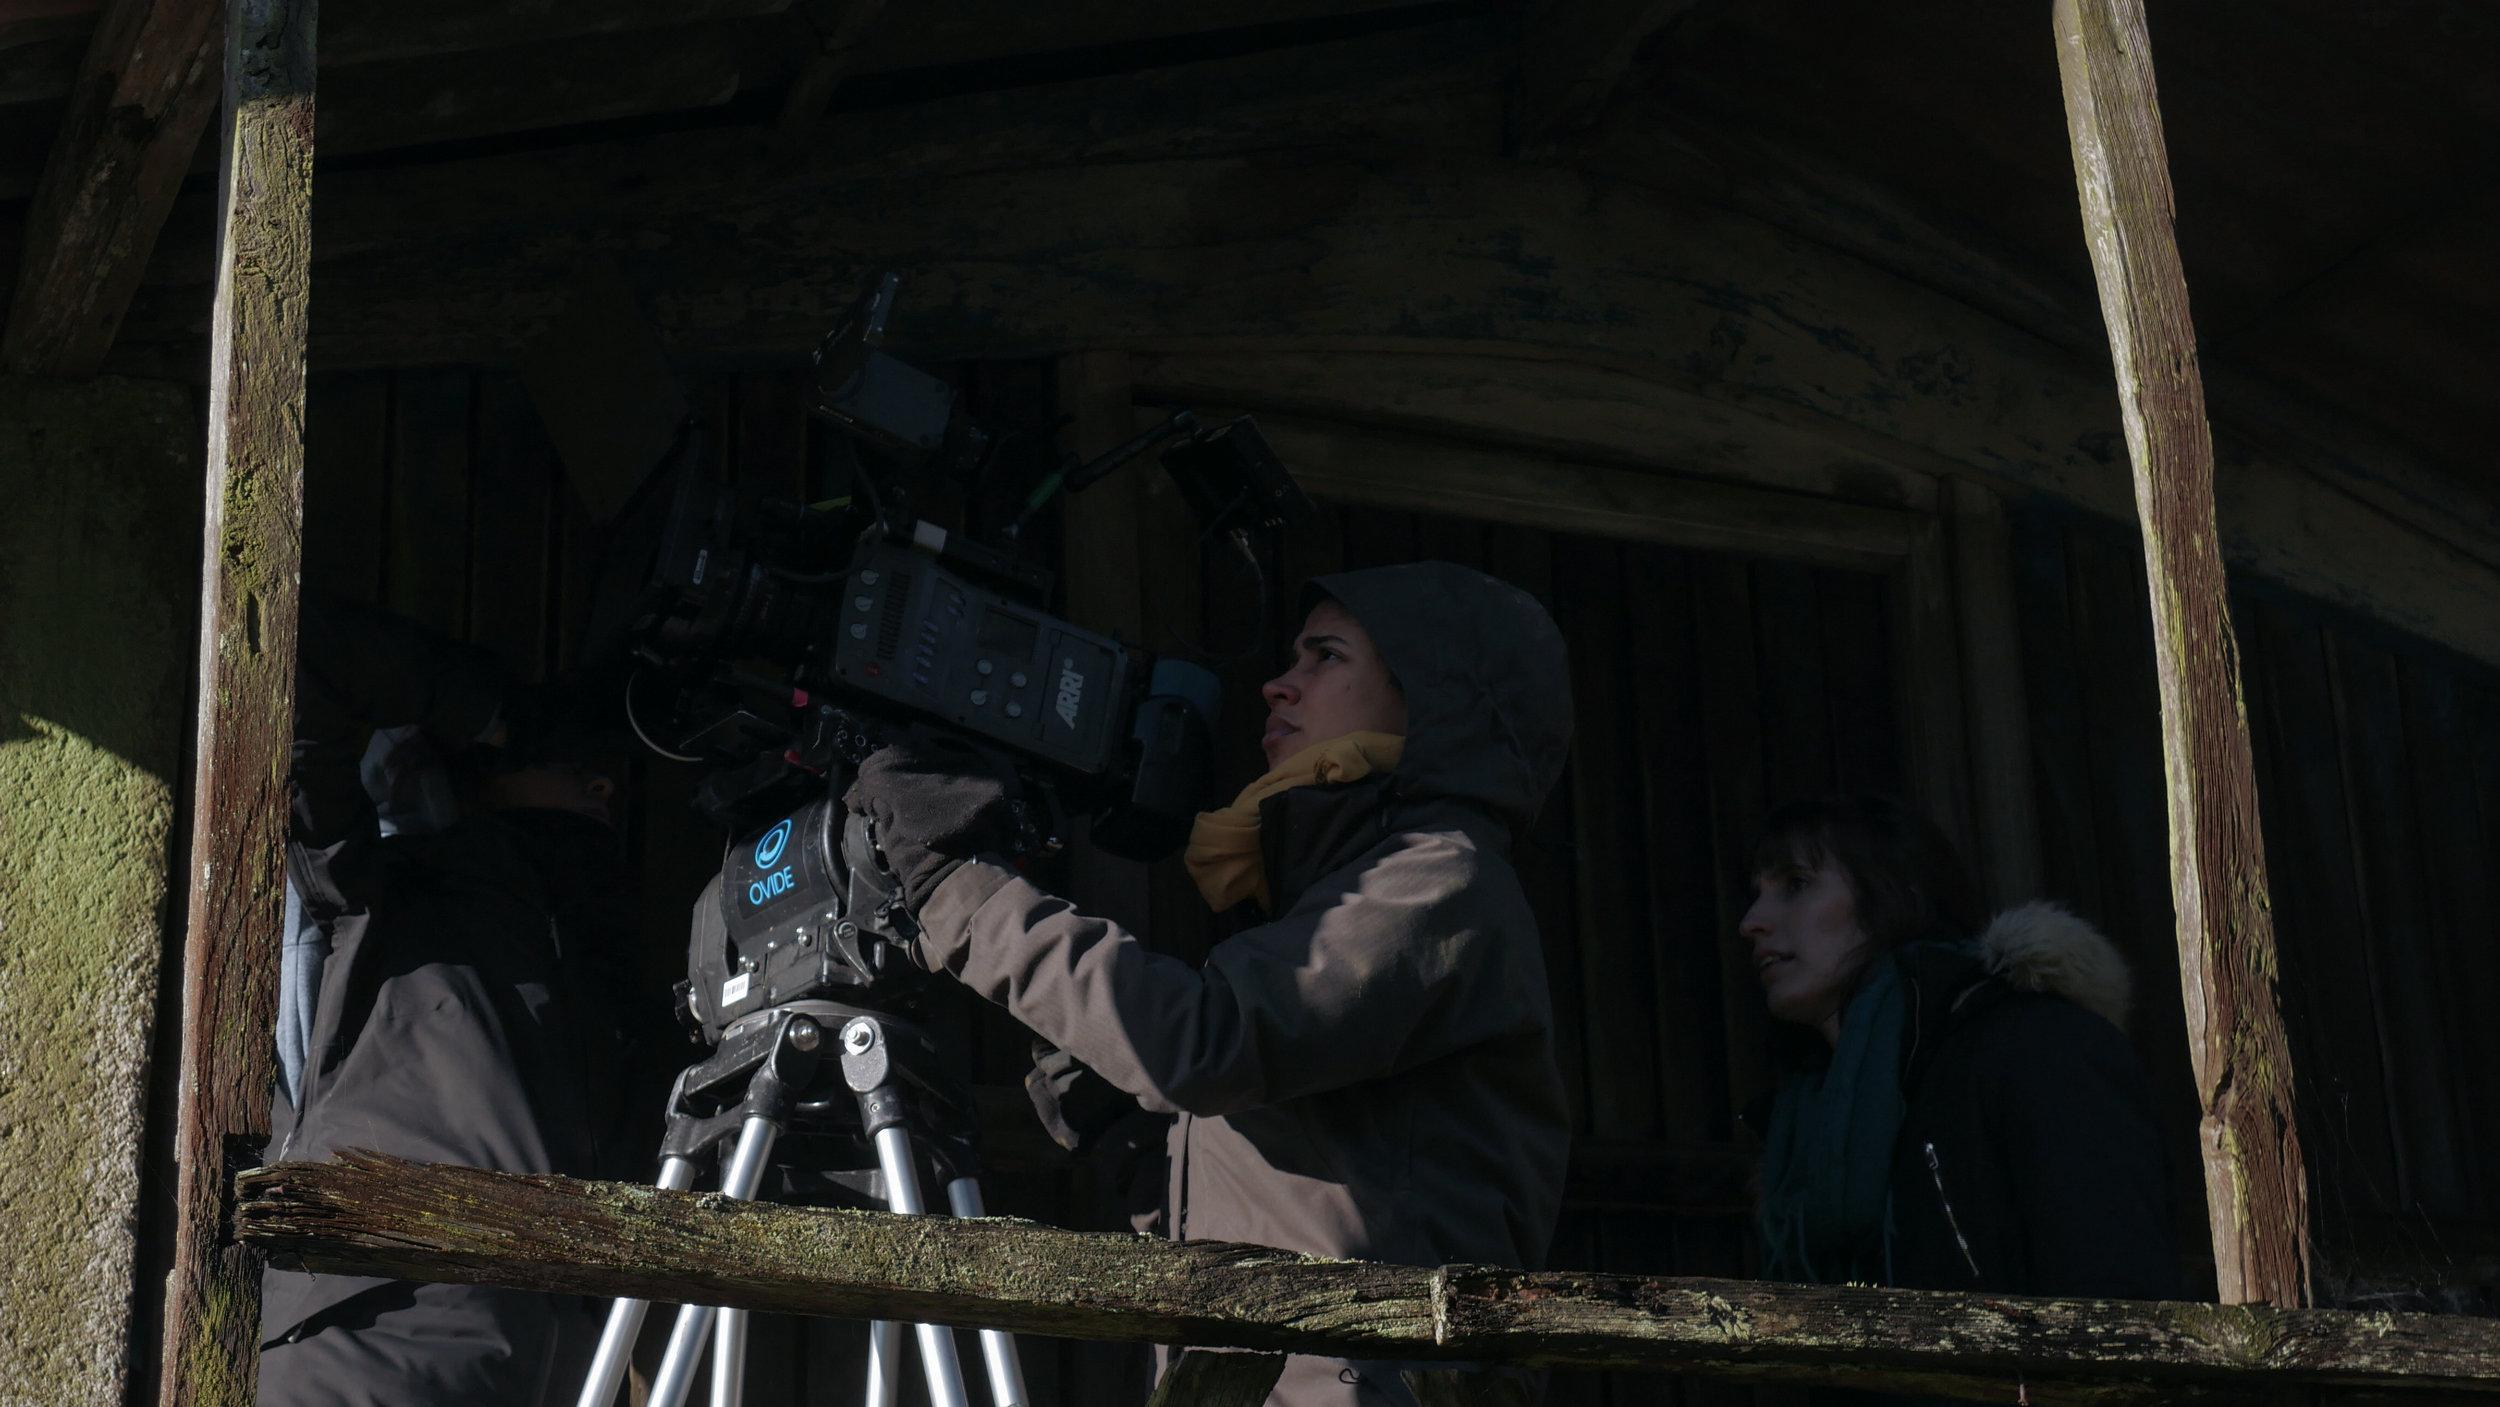 Noelia María Muíño González working with DP Lorena on set in Spain